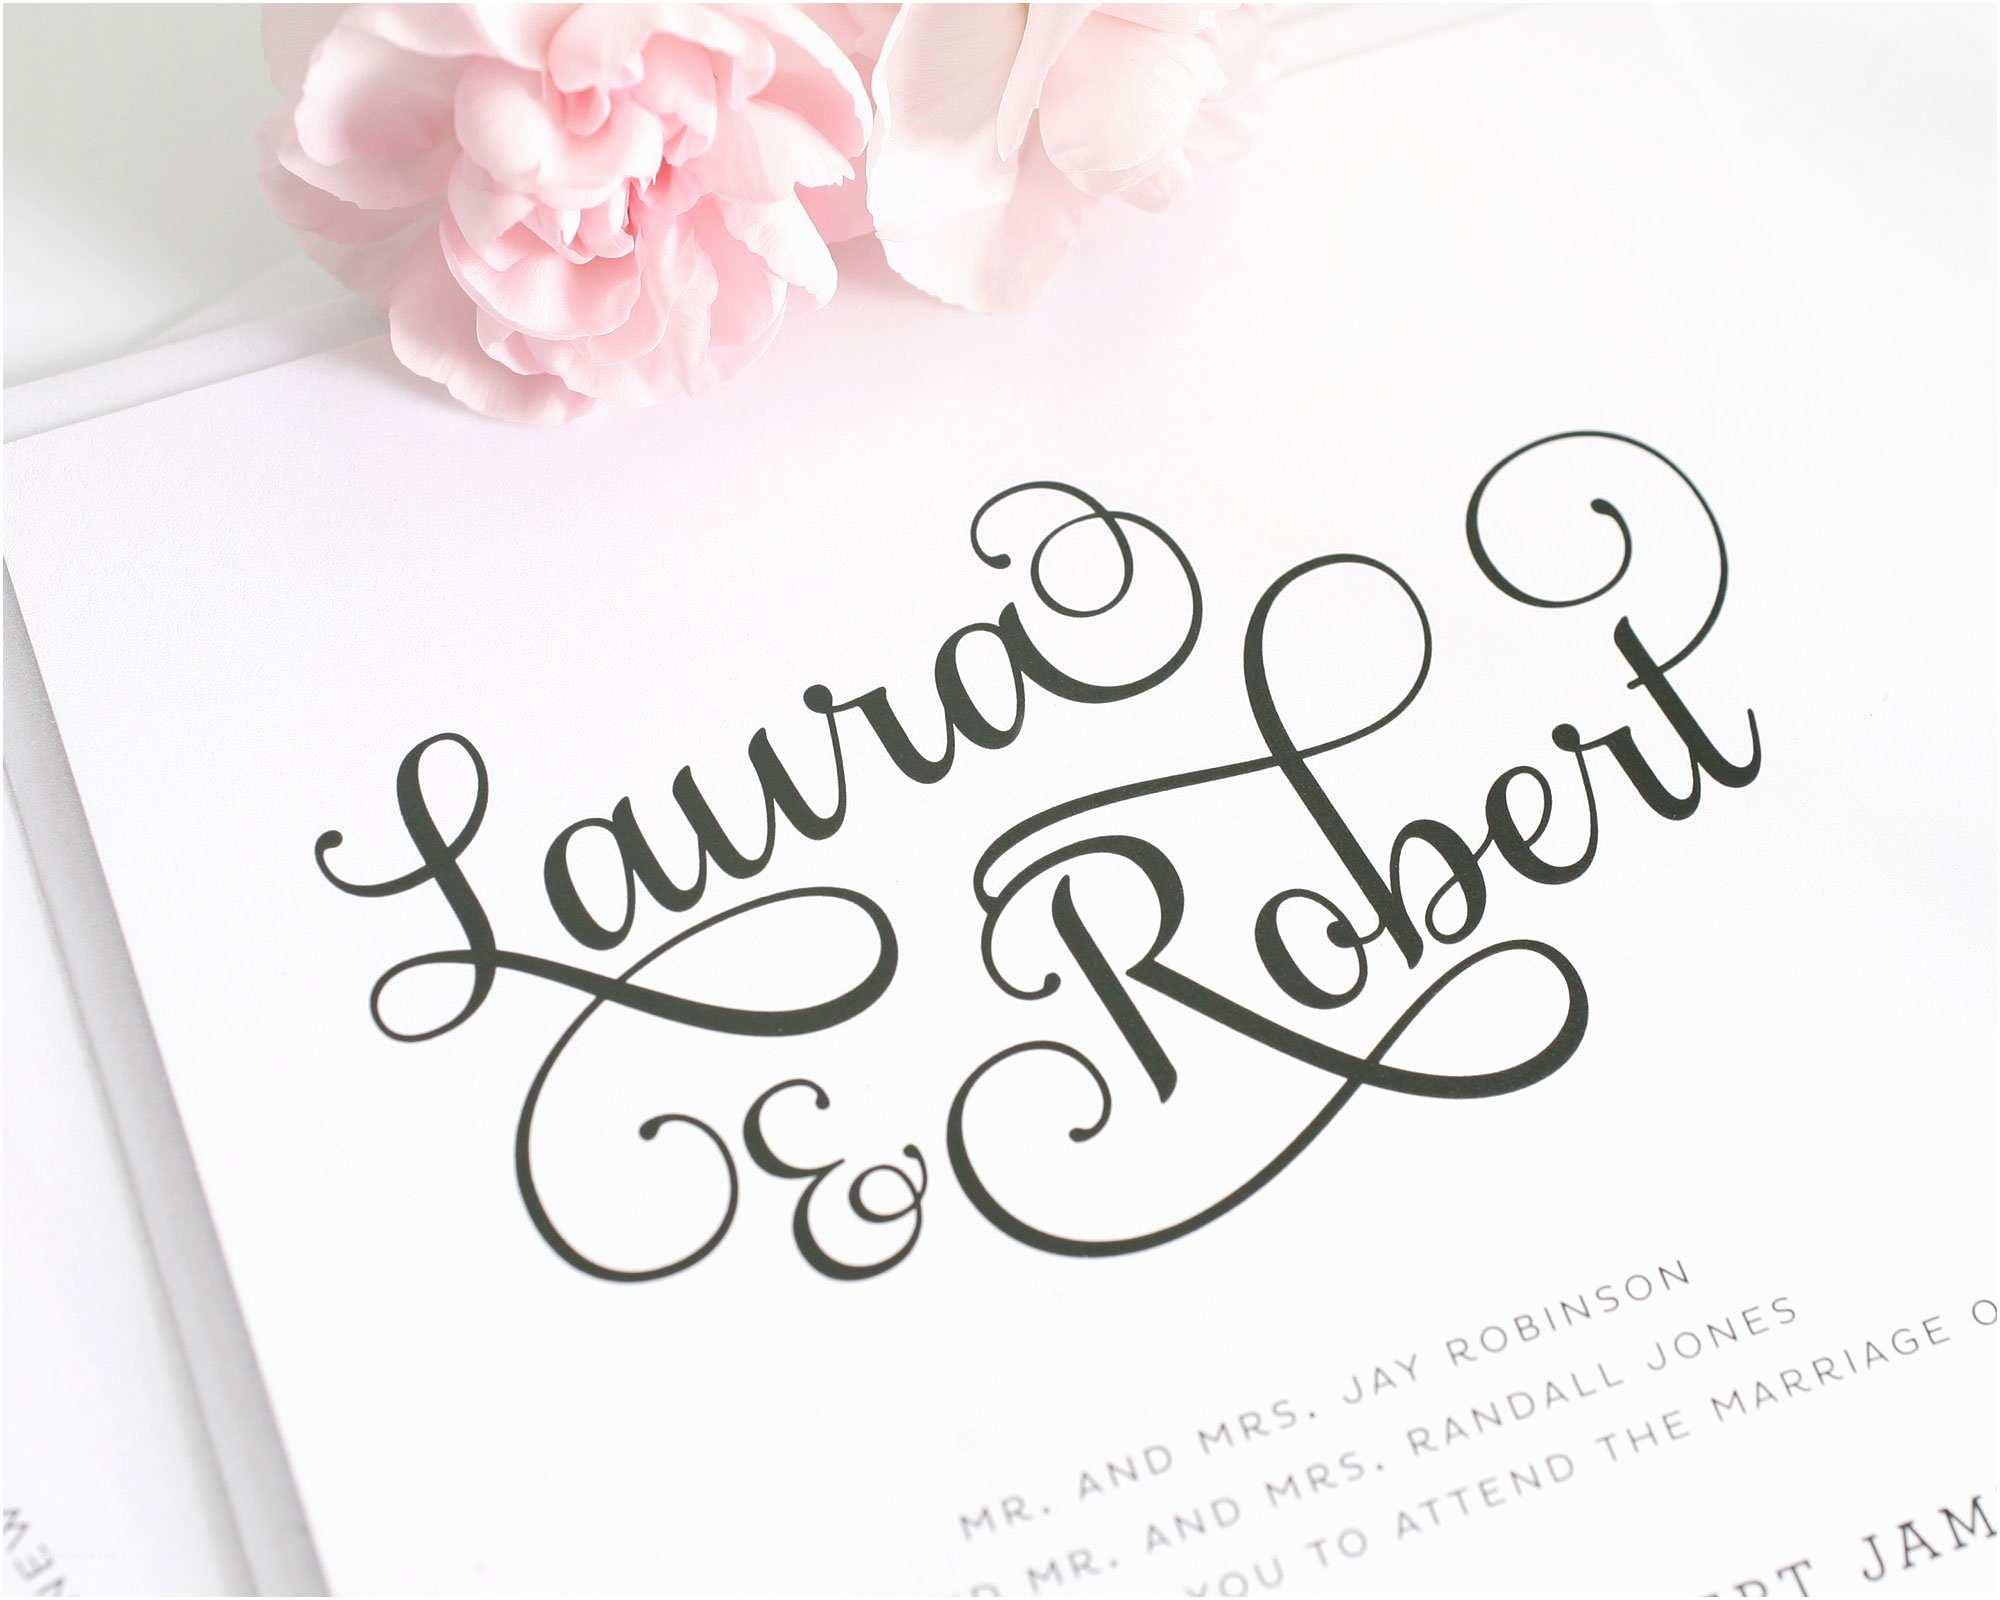 Truly Romantic Wedding Invitations Sweet Romance Wedding Invitations Wedding Invitations by